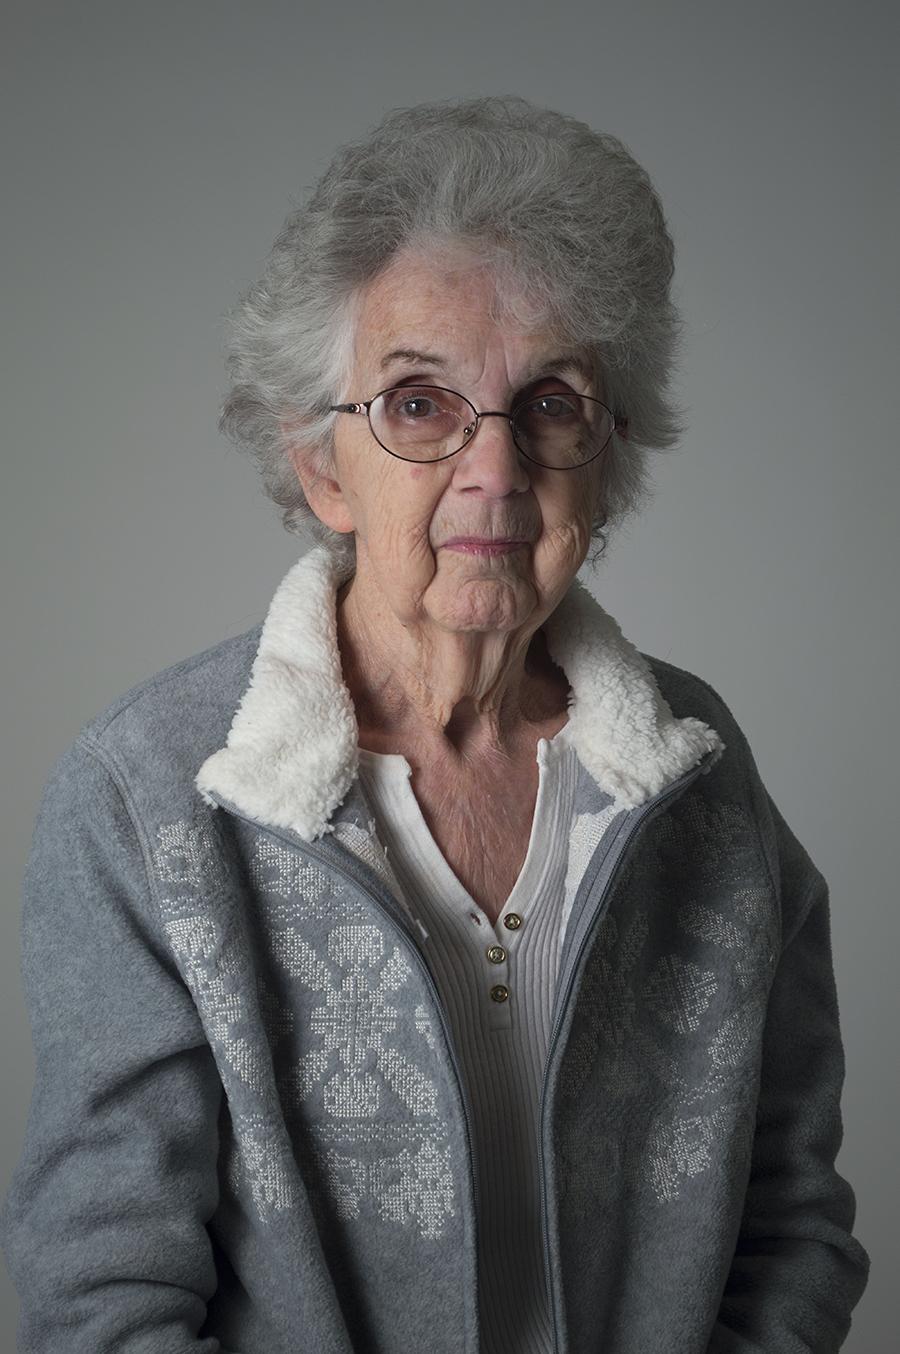 Kieran_Koch-Laskowski_Portraiture_Nana_Three-Fourths_old_women_grandmothers_love_family